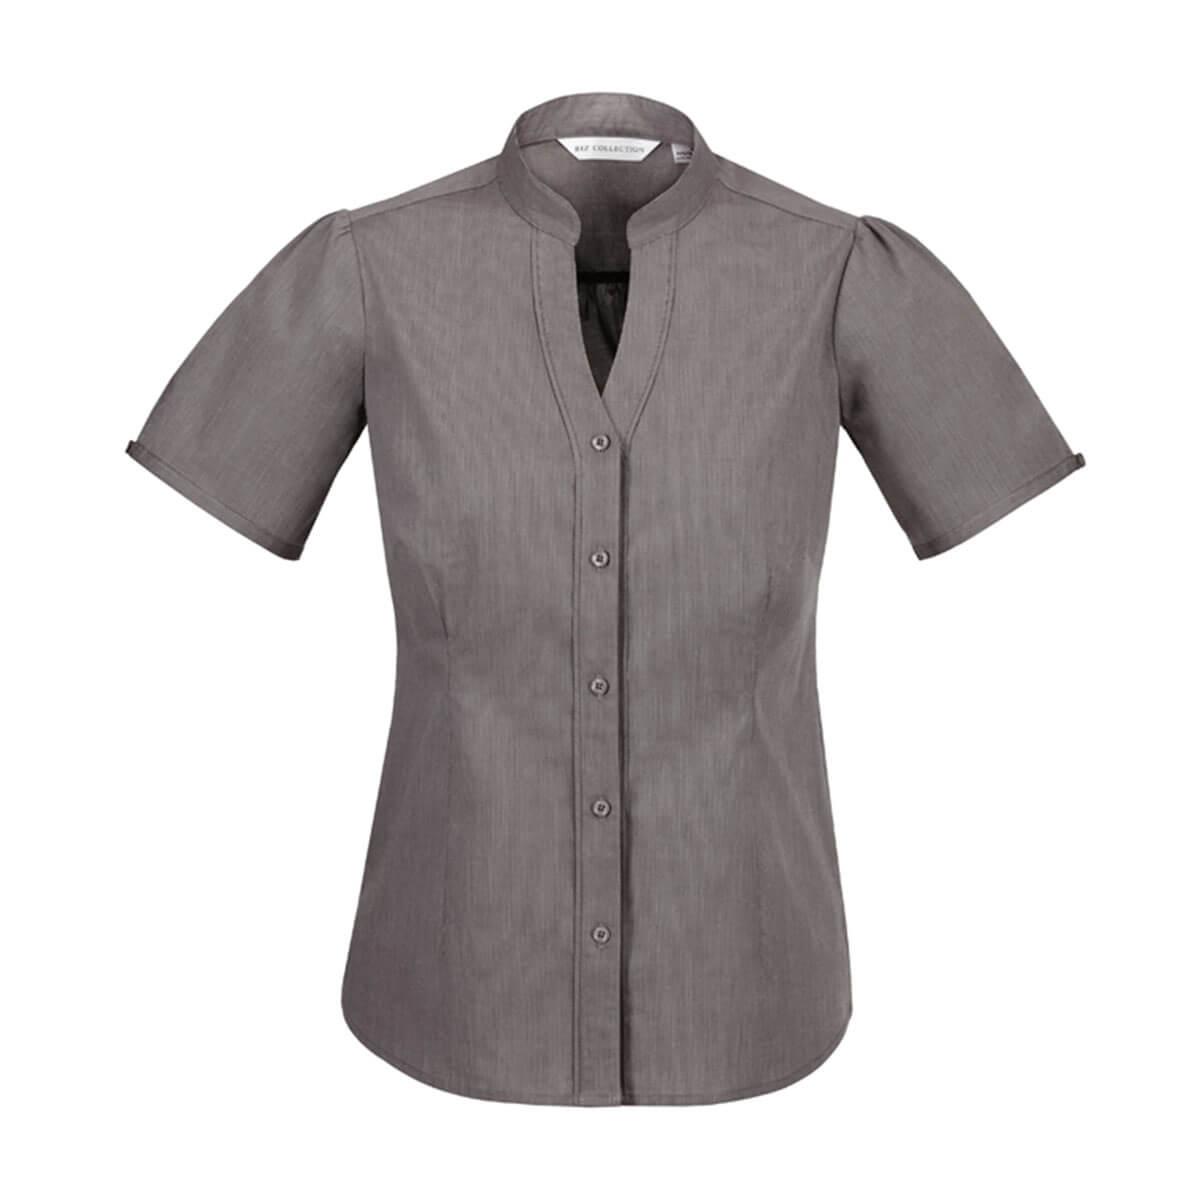 Ladies Chevron Stand Collar Shirt-Graphite